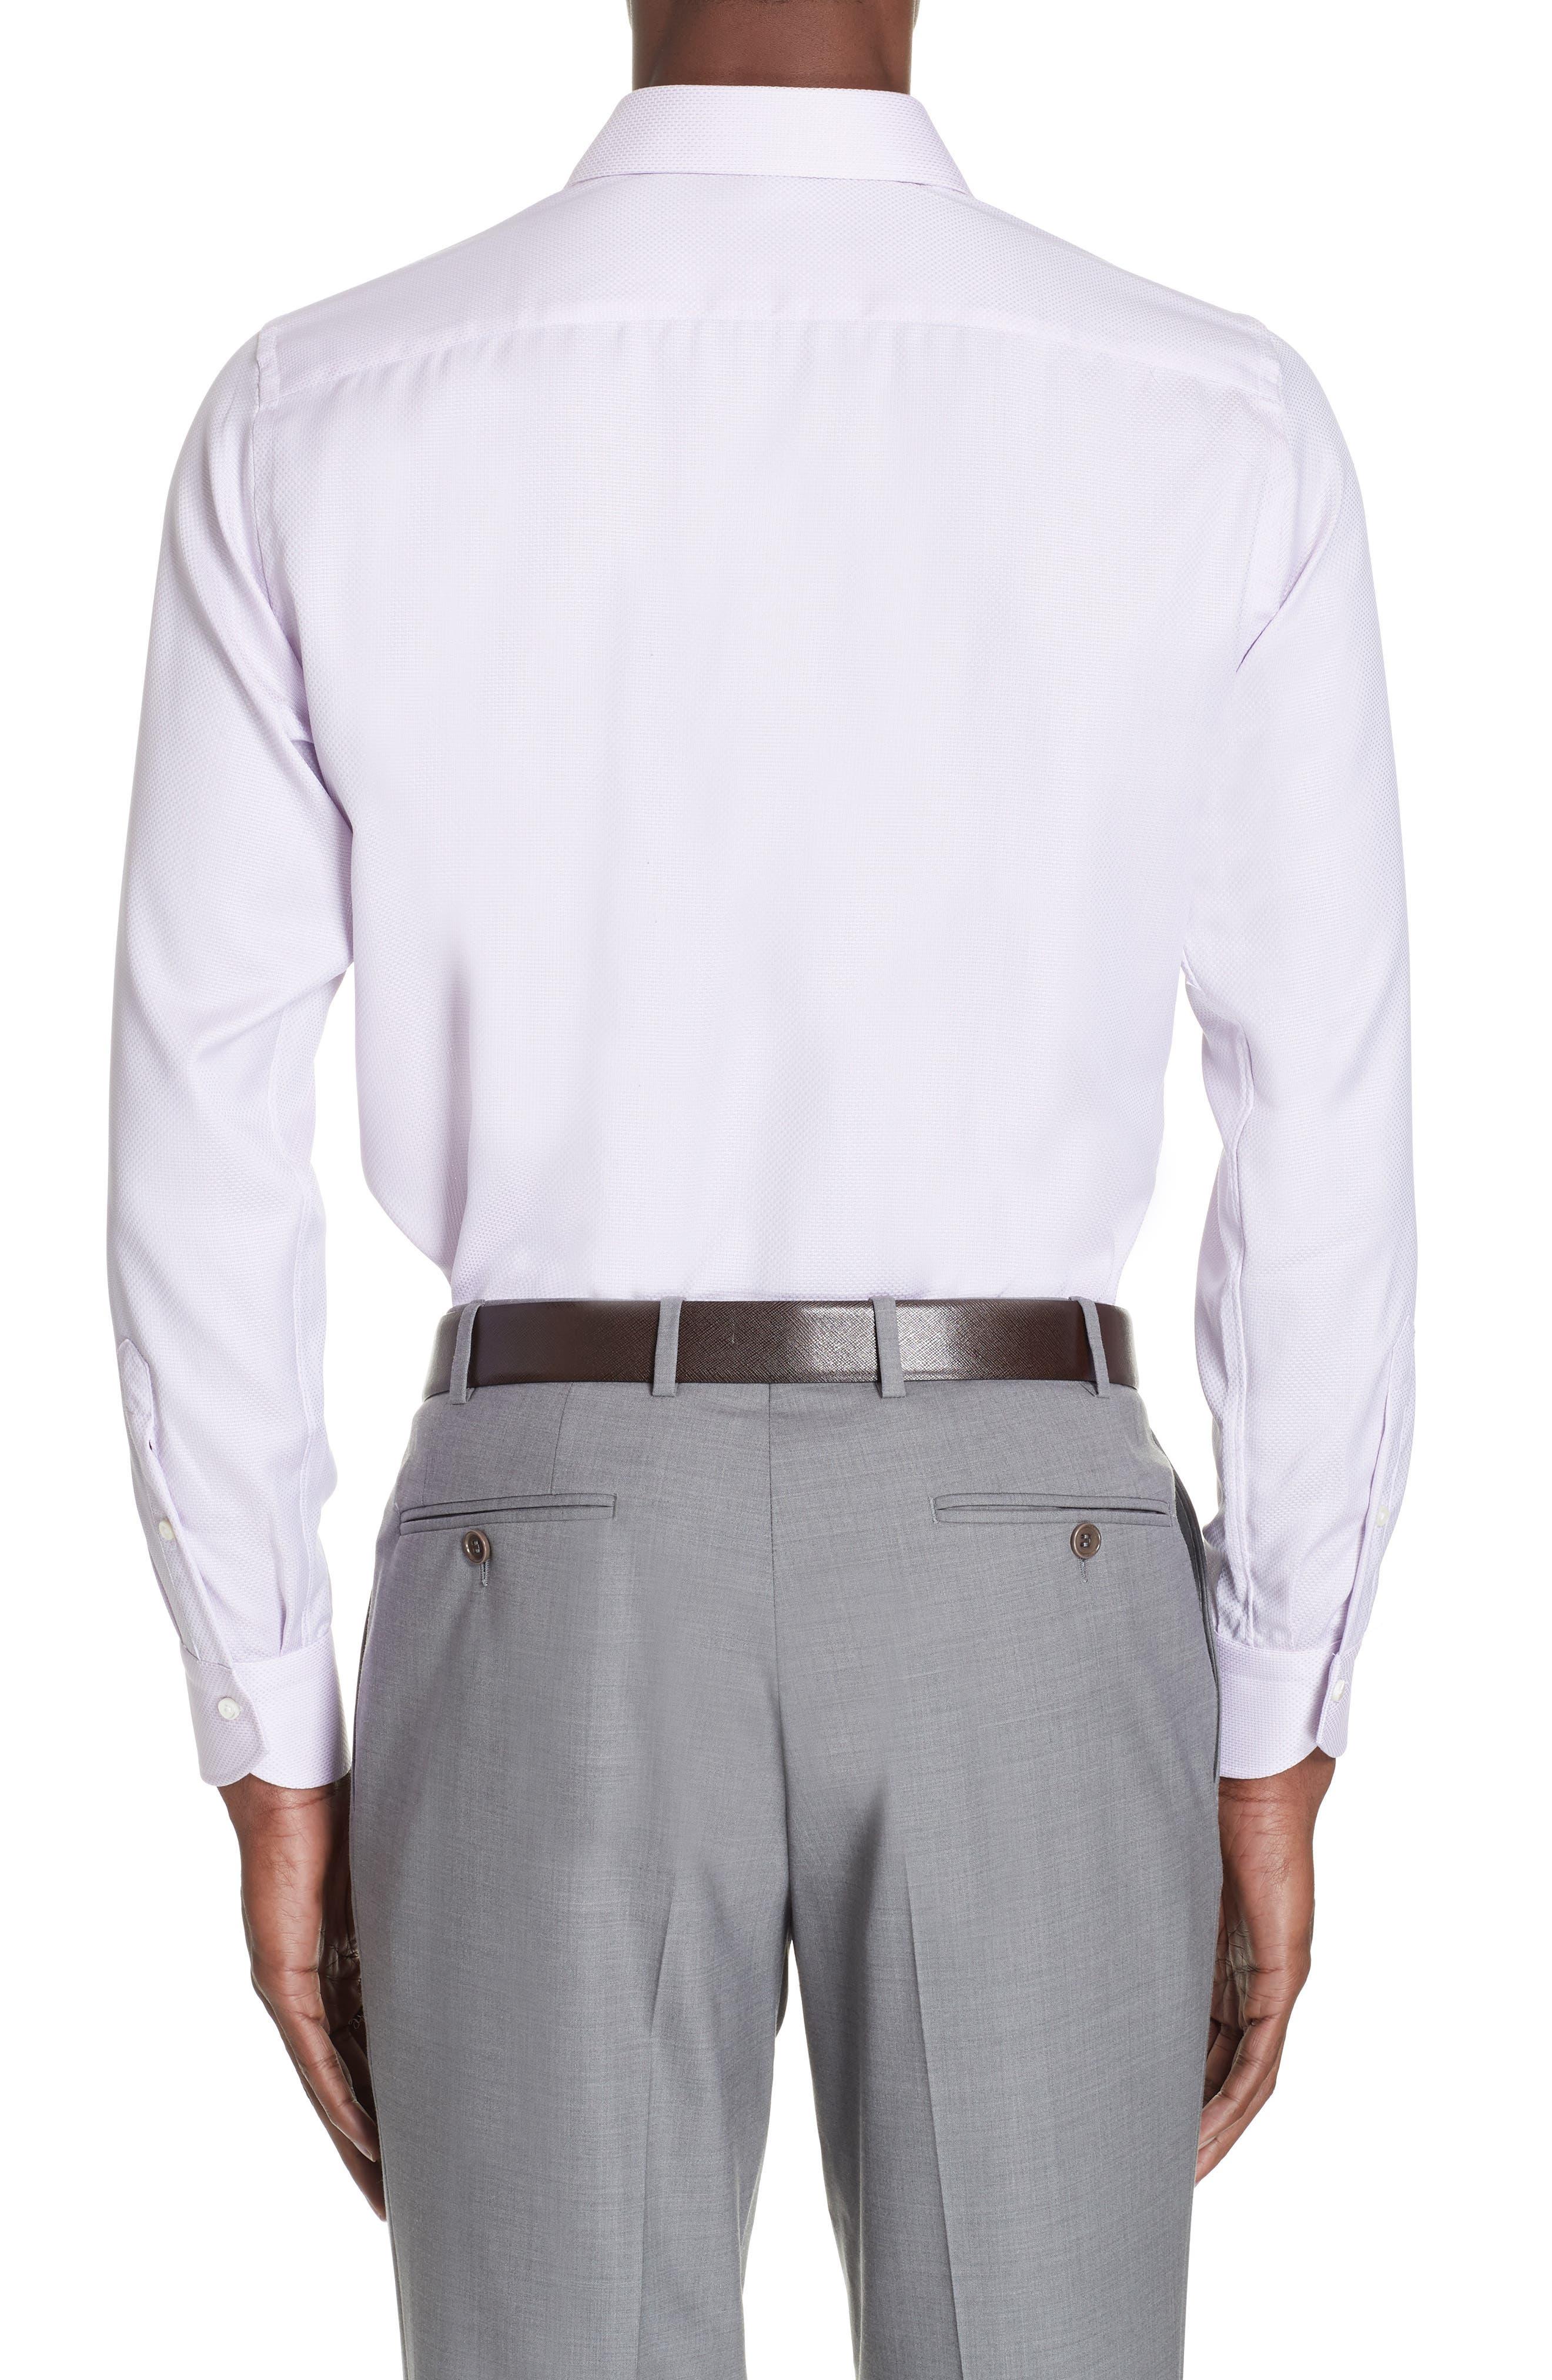 Trim Fit Solid Dress Shirt,                             Alternate thumbnail 3, color,                             LIGHT PINK